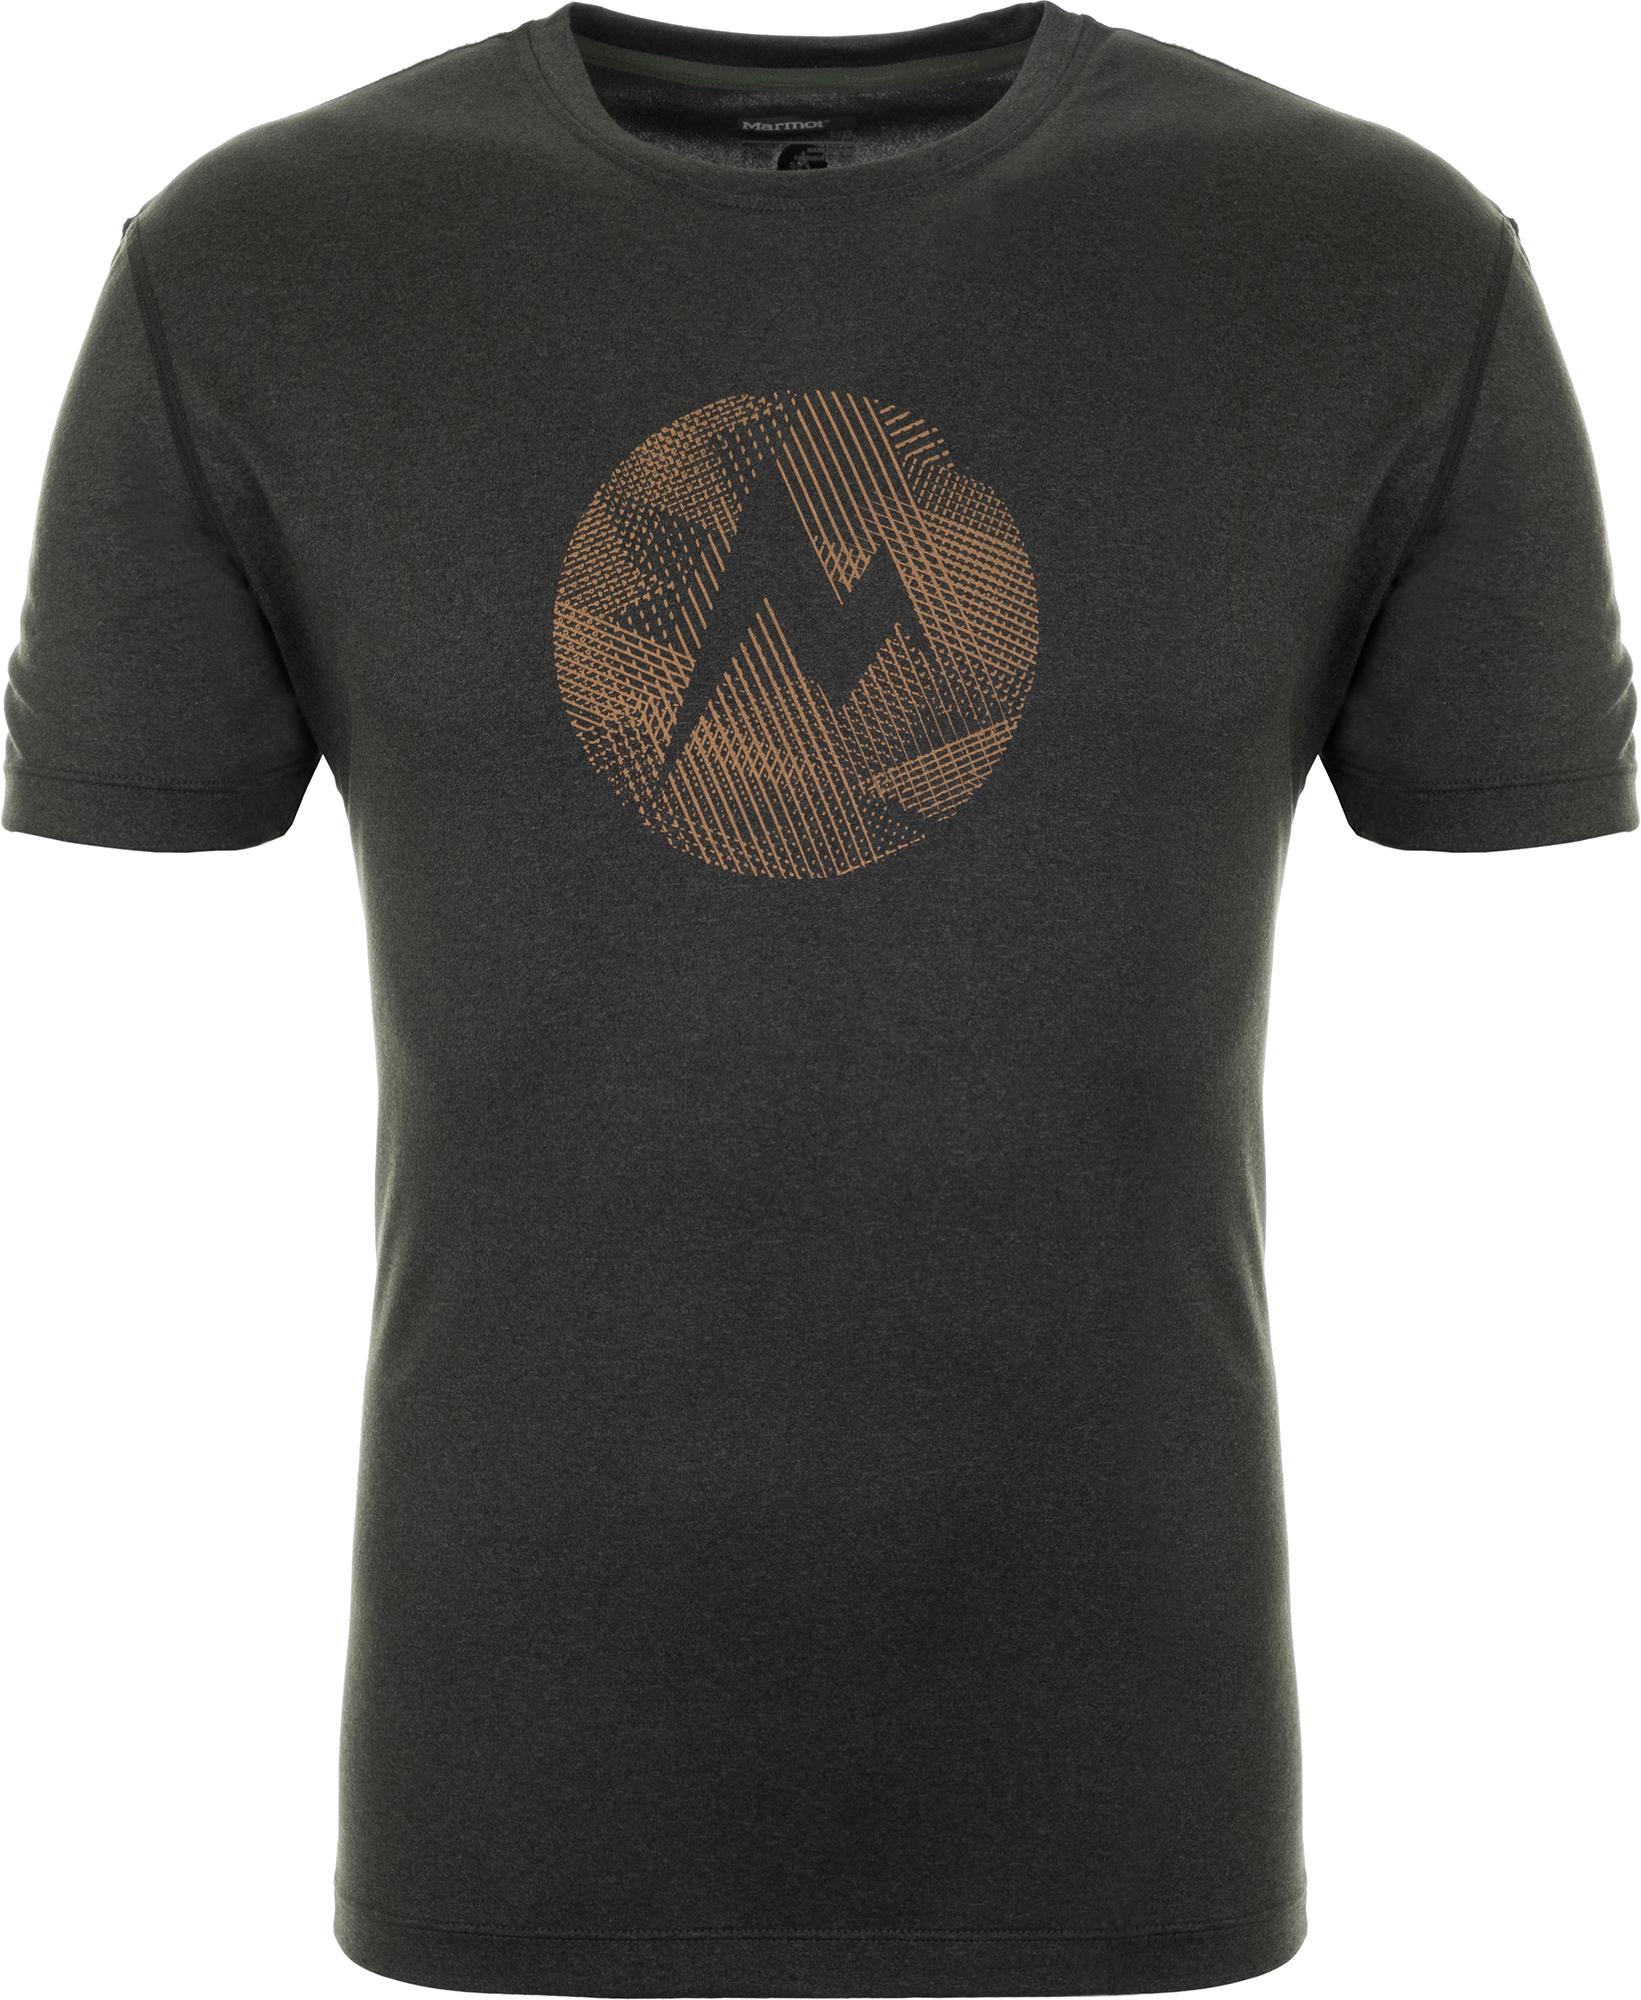 цена на Marmot Футболка мужская Marmot, размер 46-48